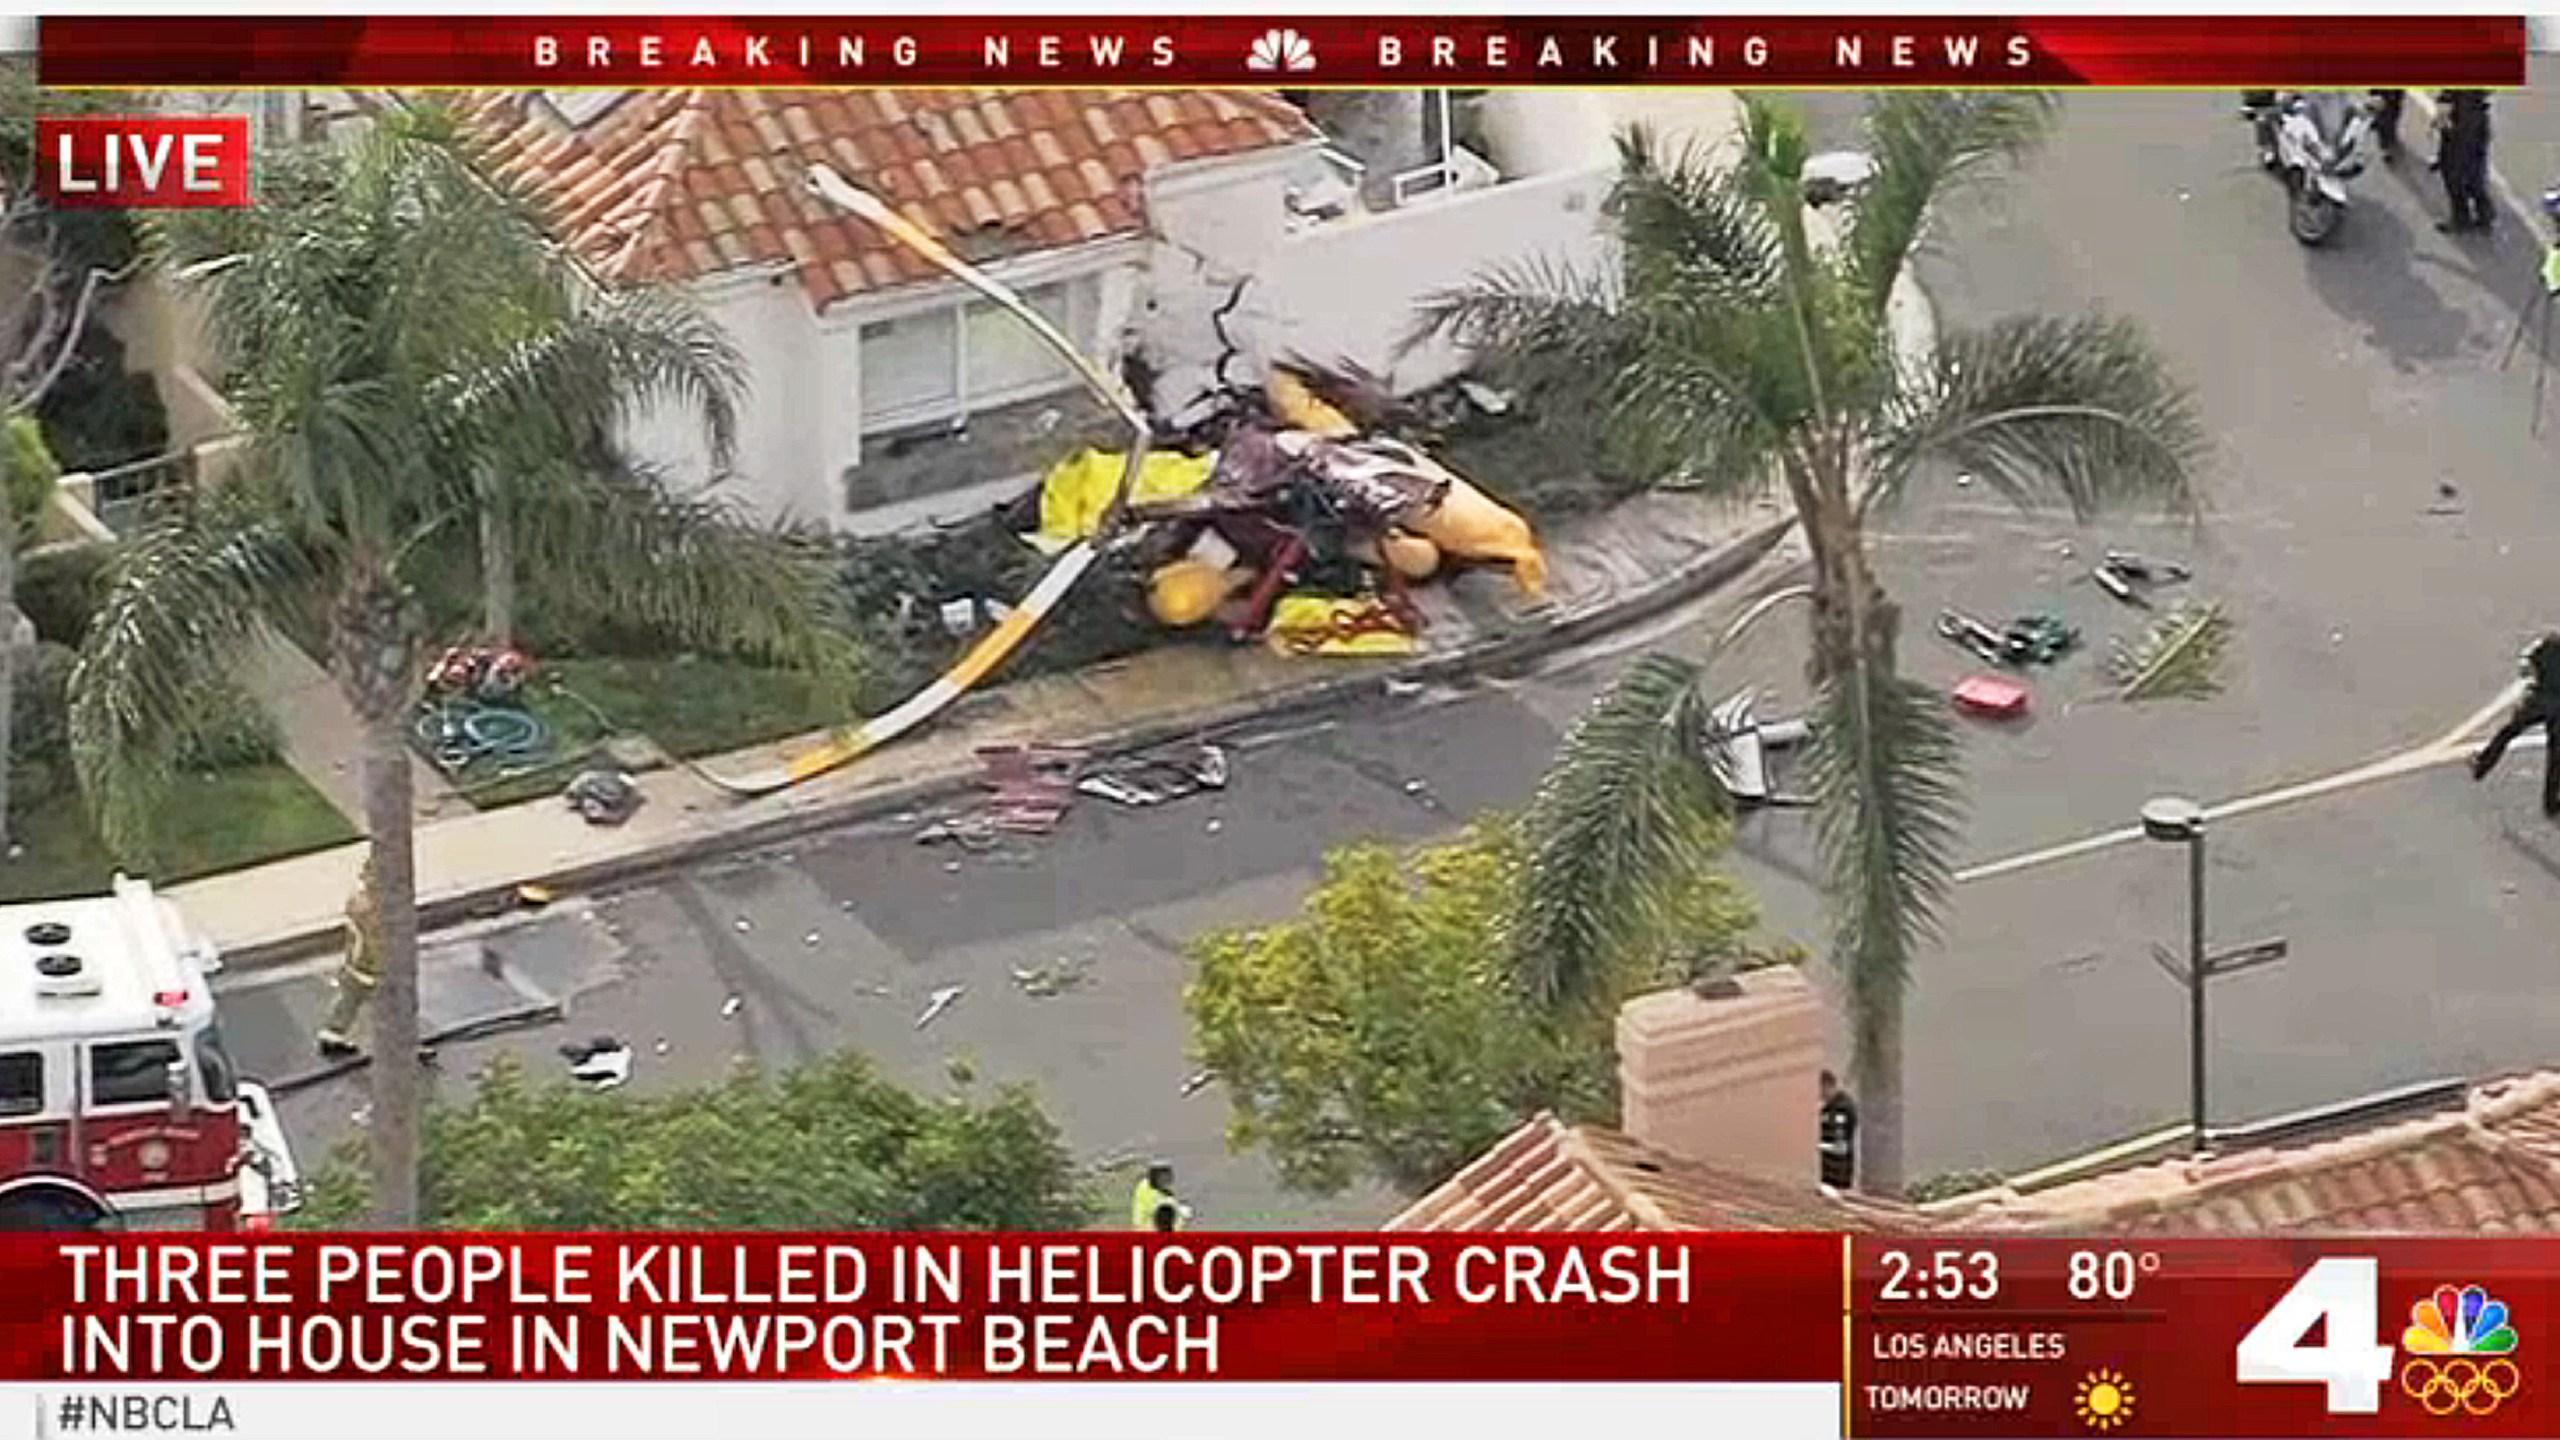 Helicopter Crash_686686